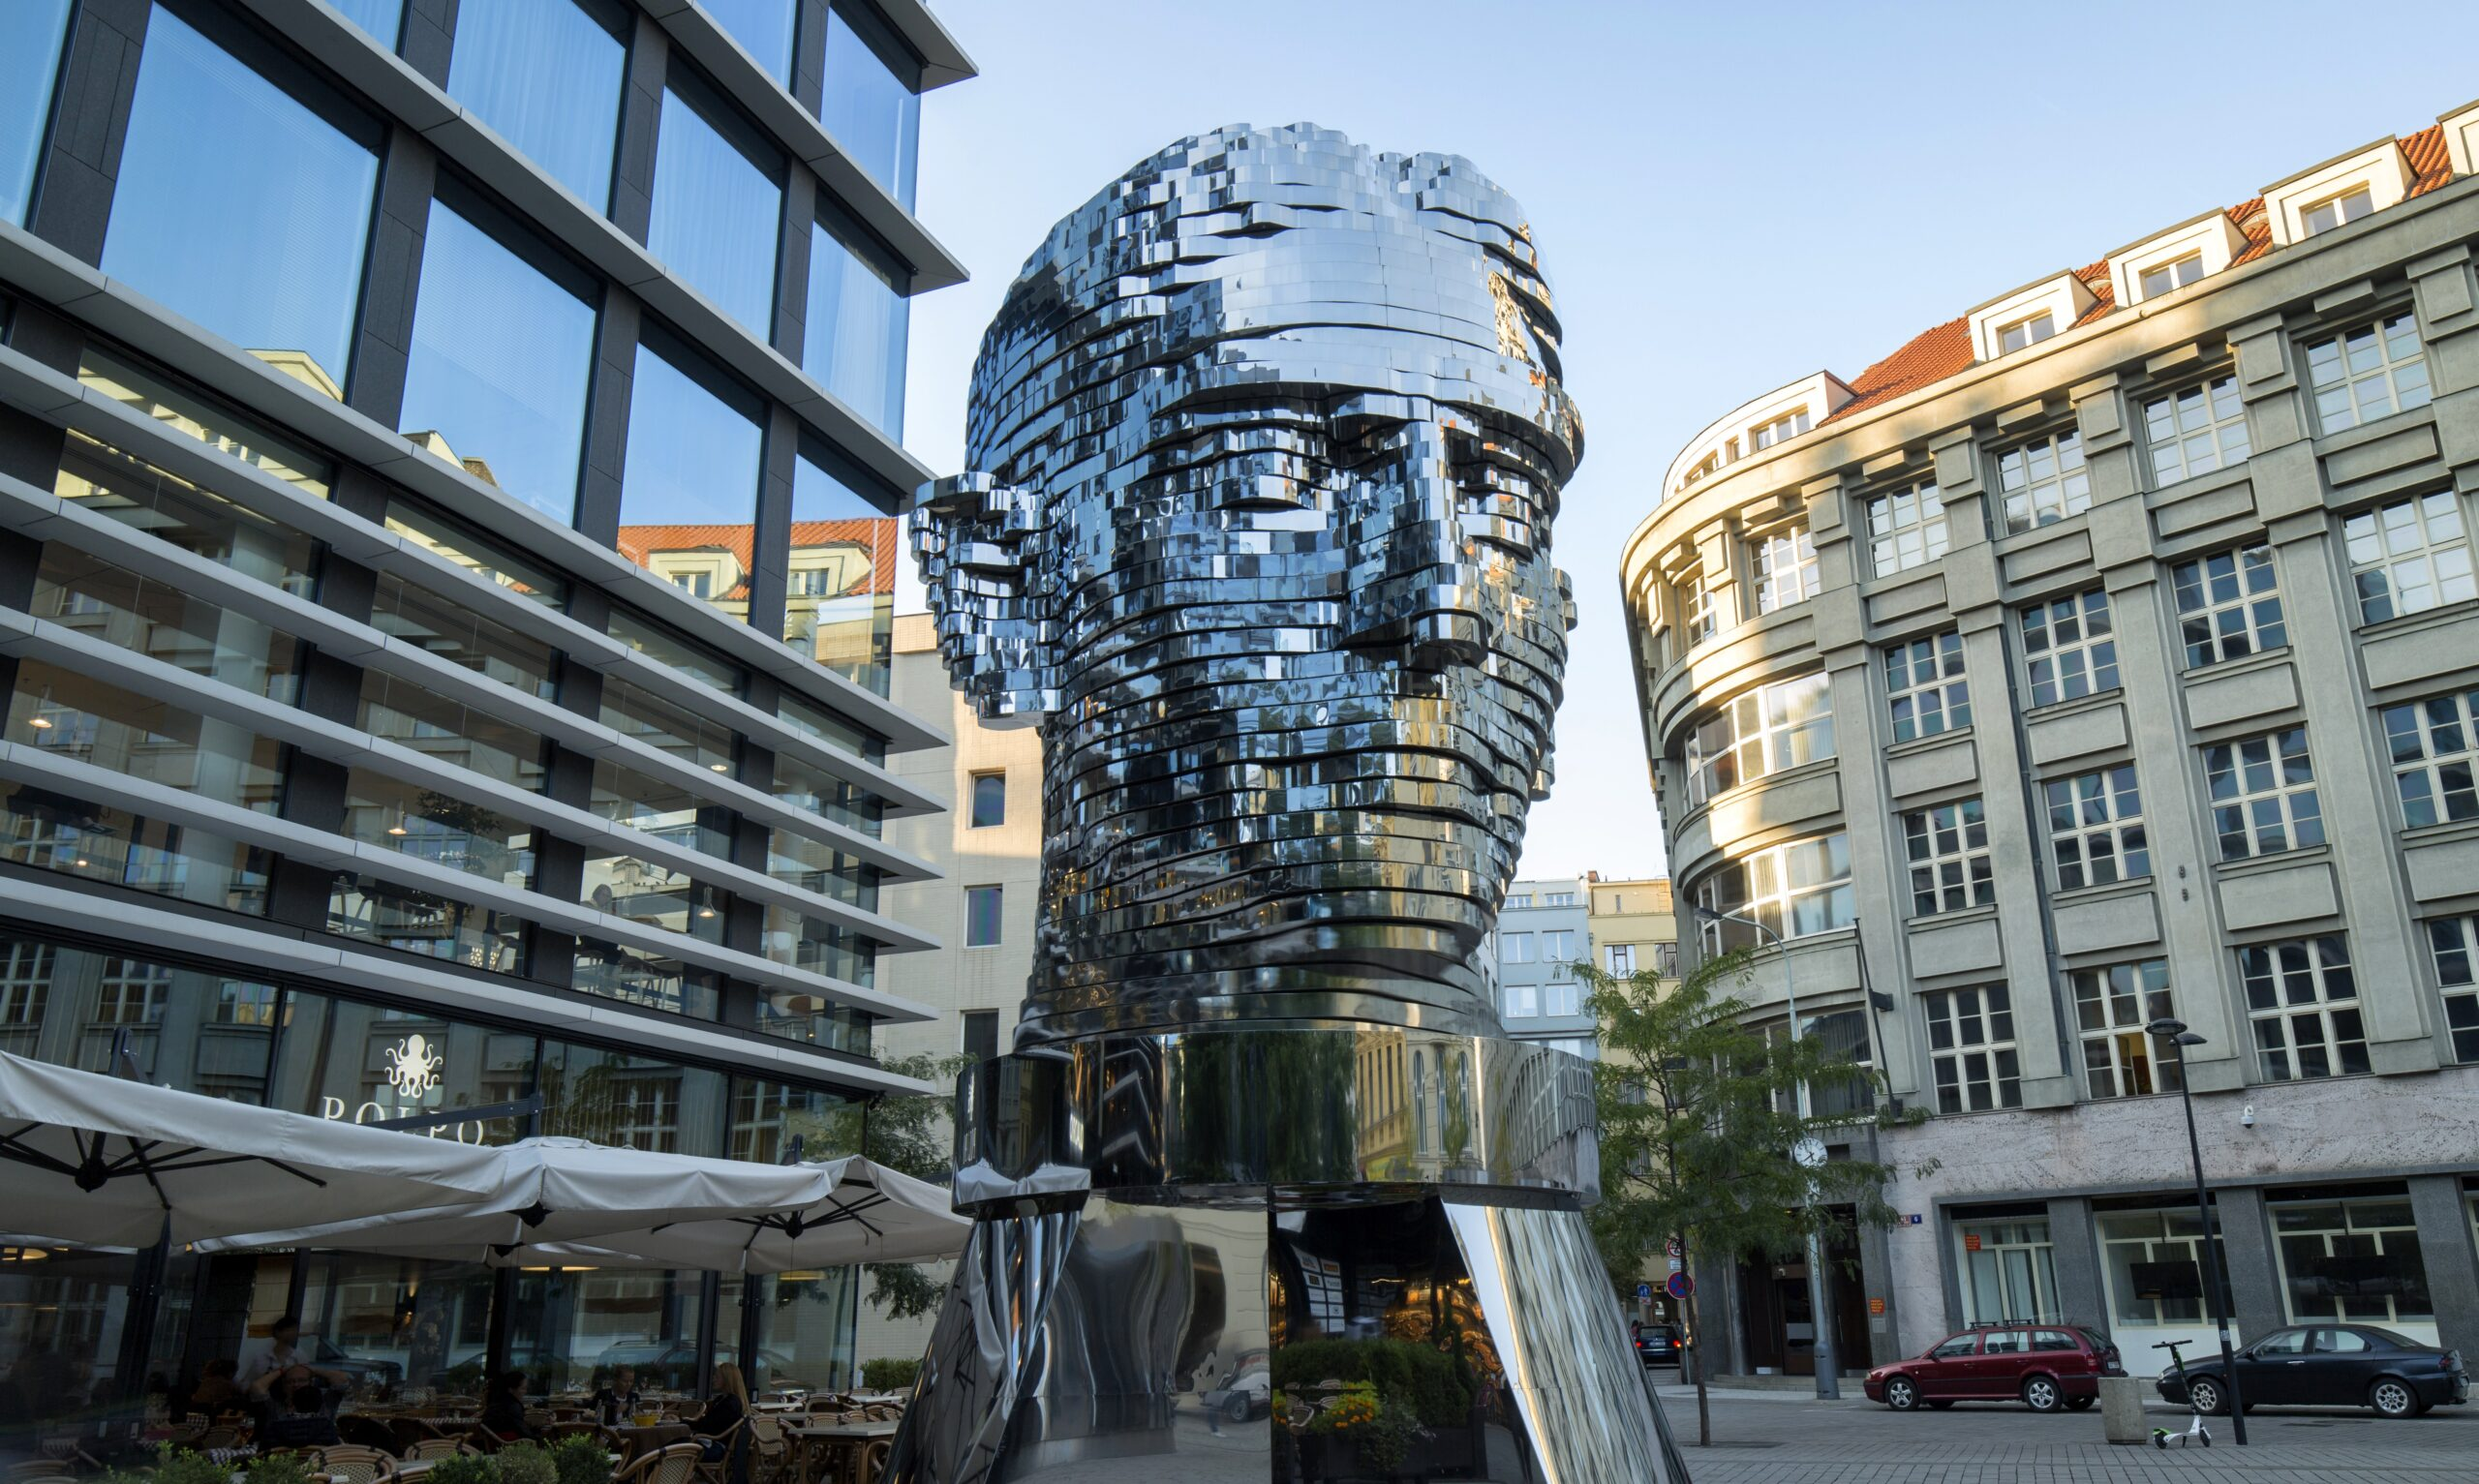 Visitare Praga e Kafka